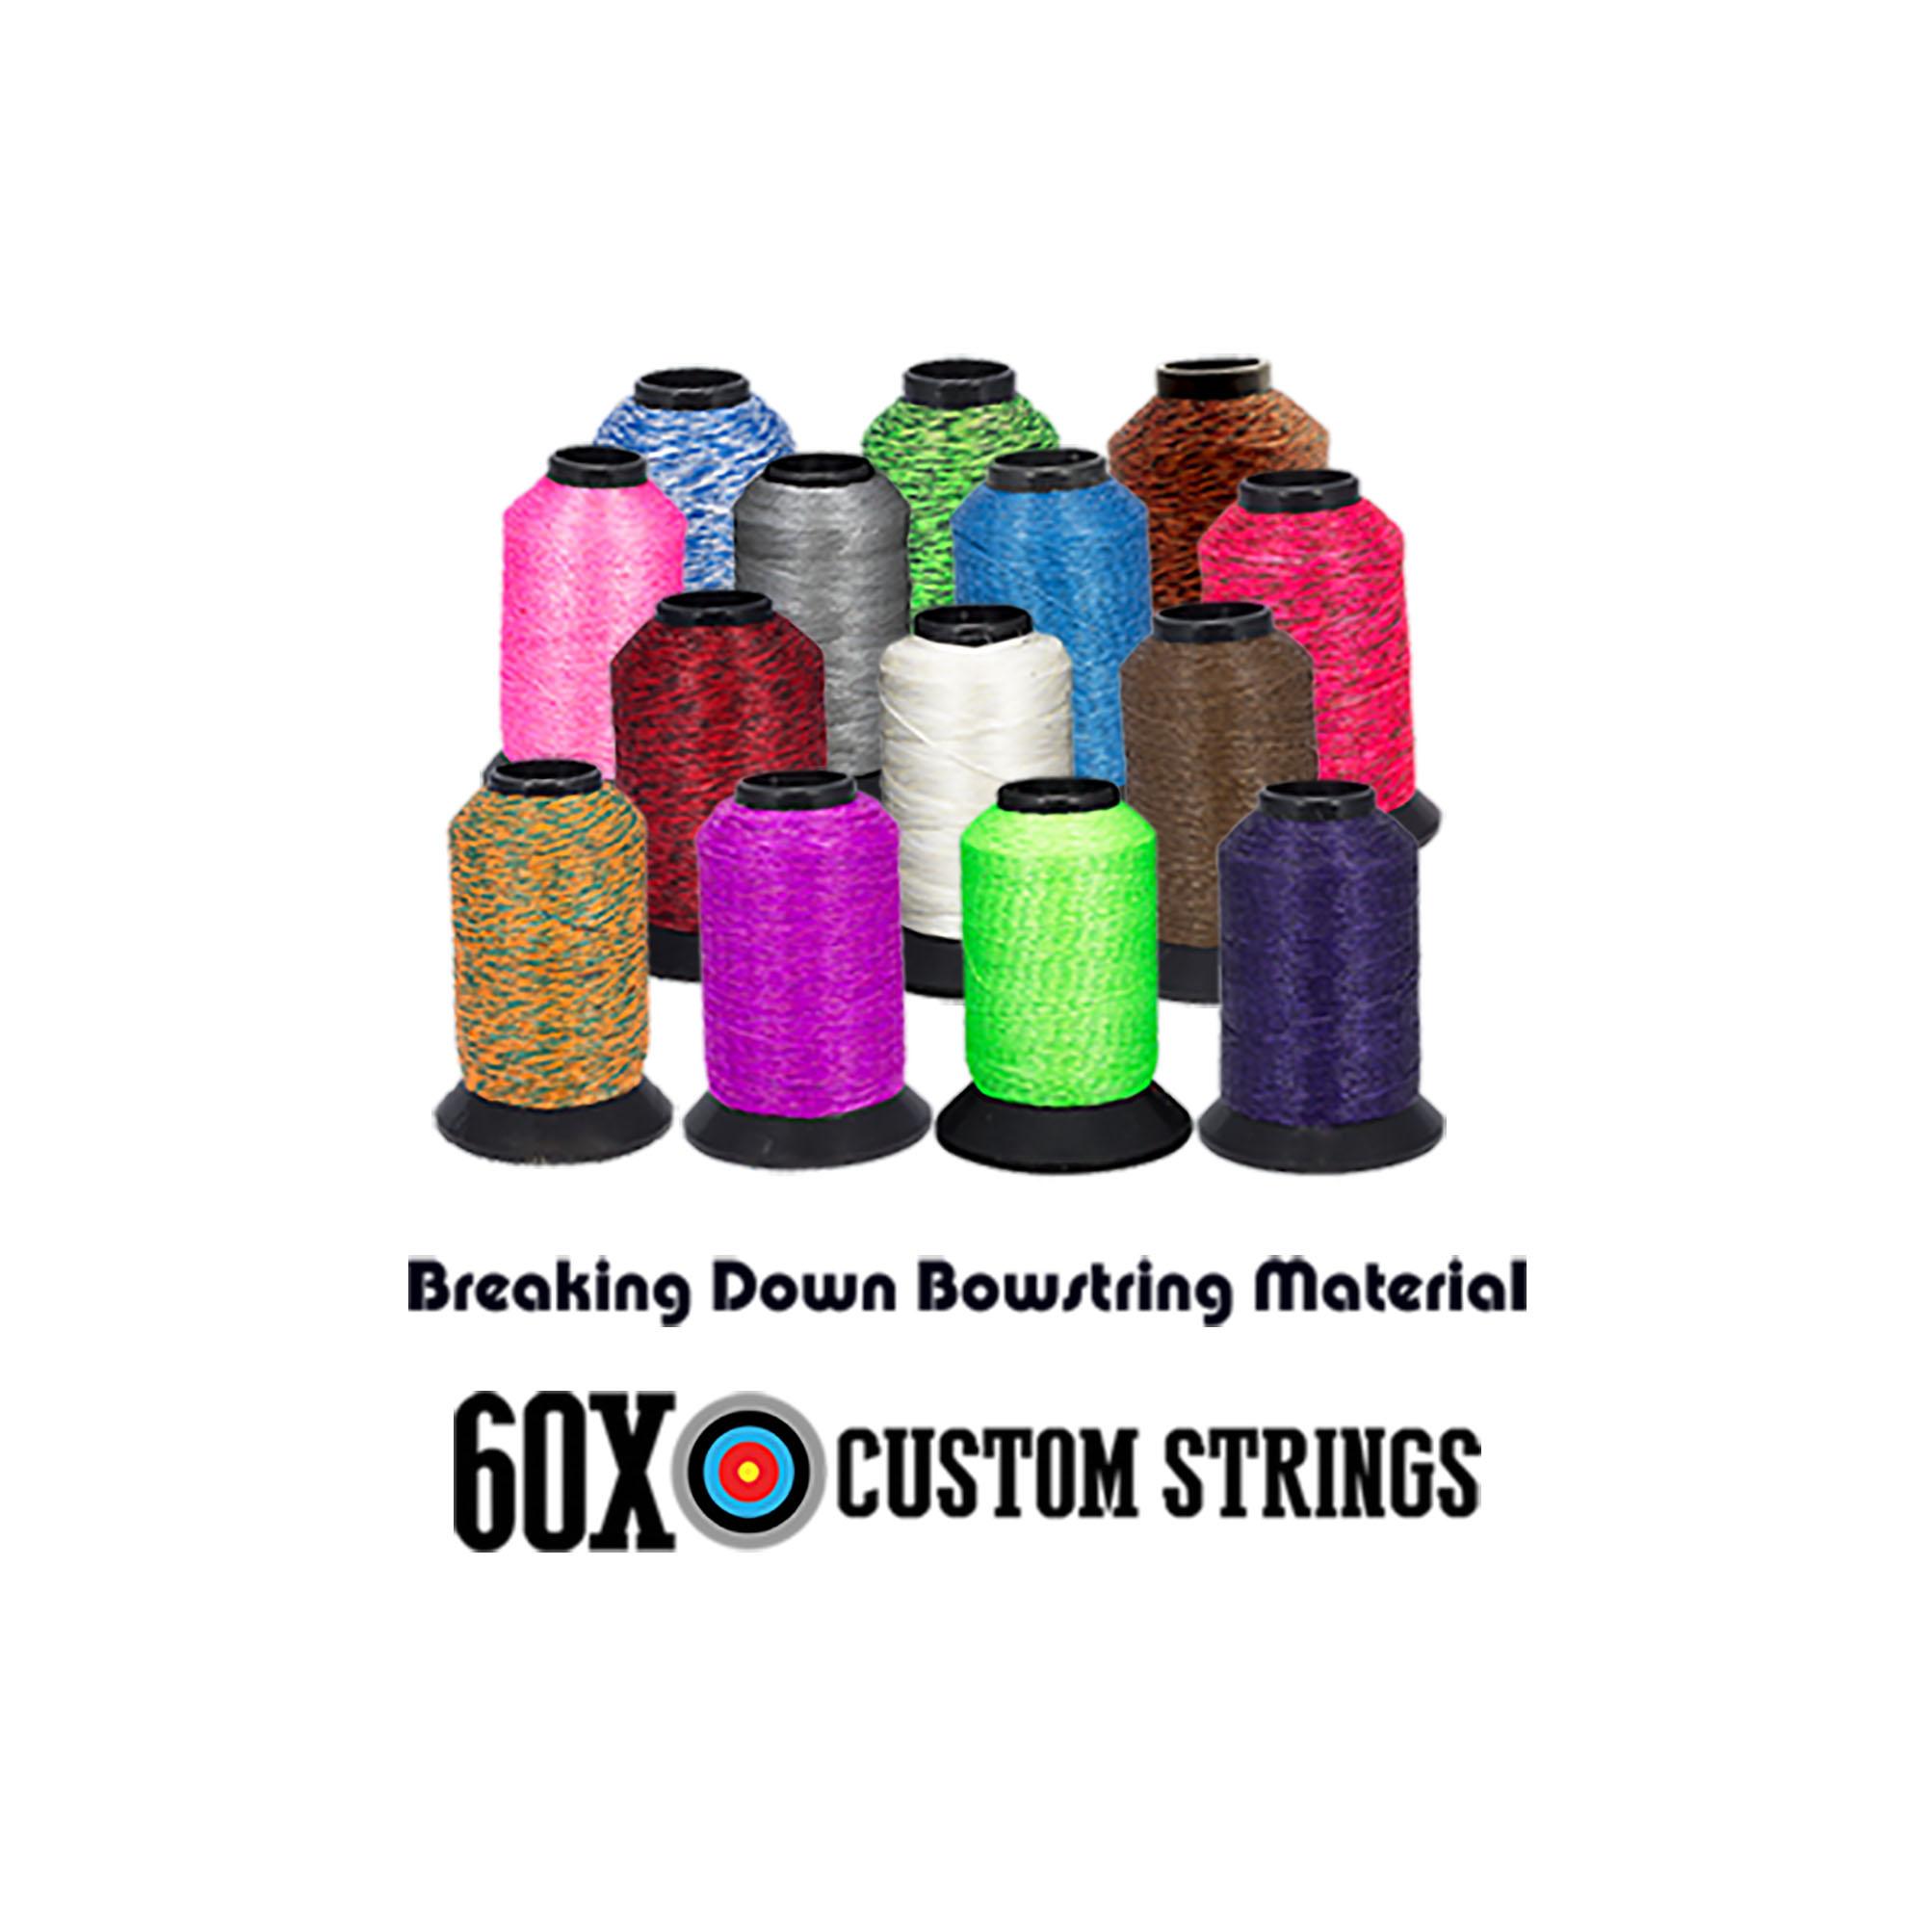 Bow String Material Guide - 60X Custom Strings